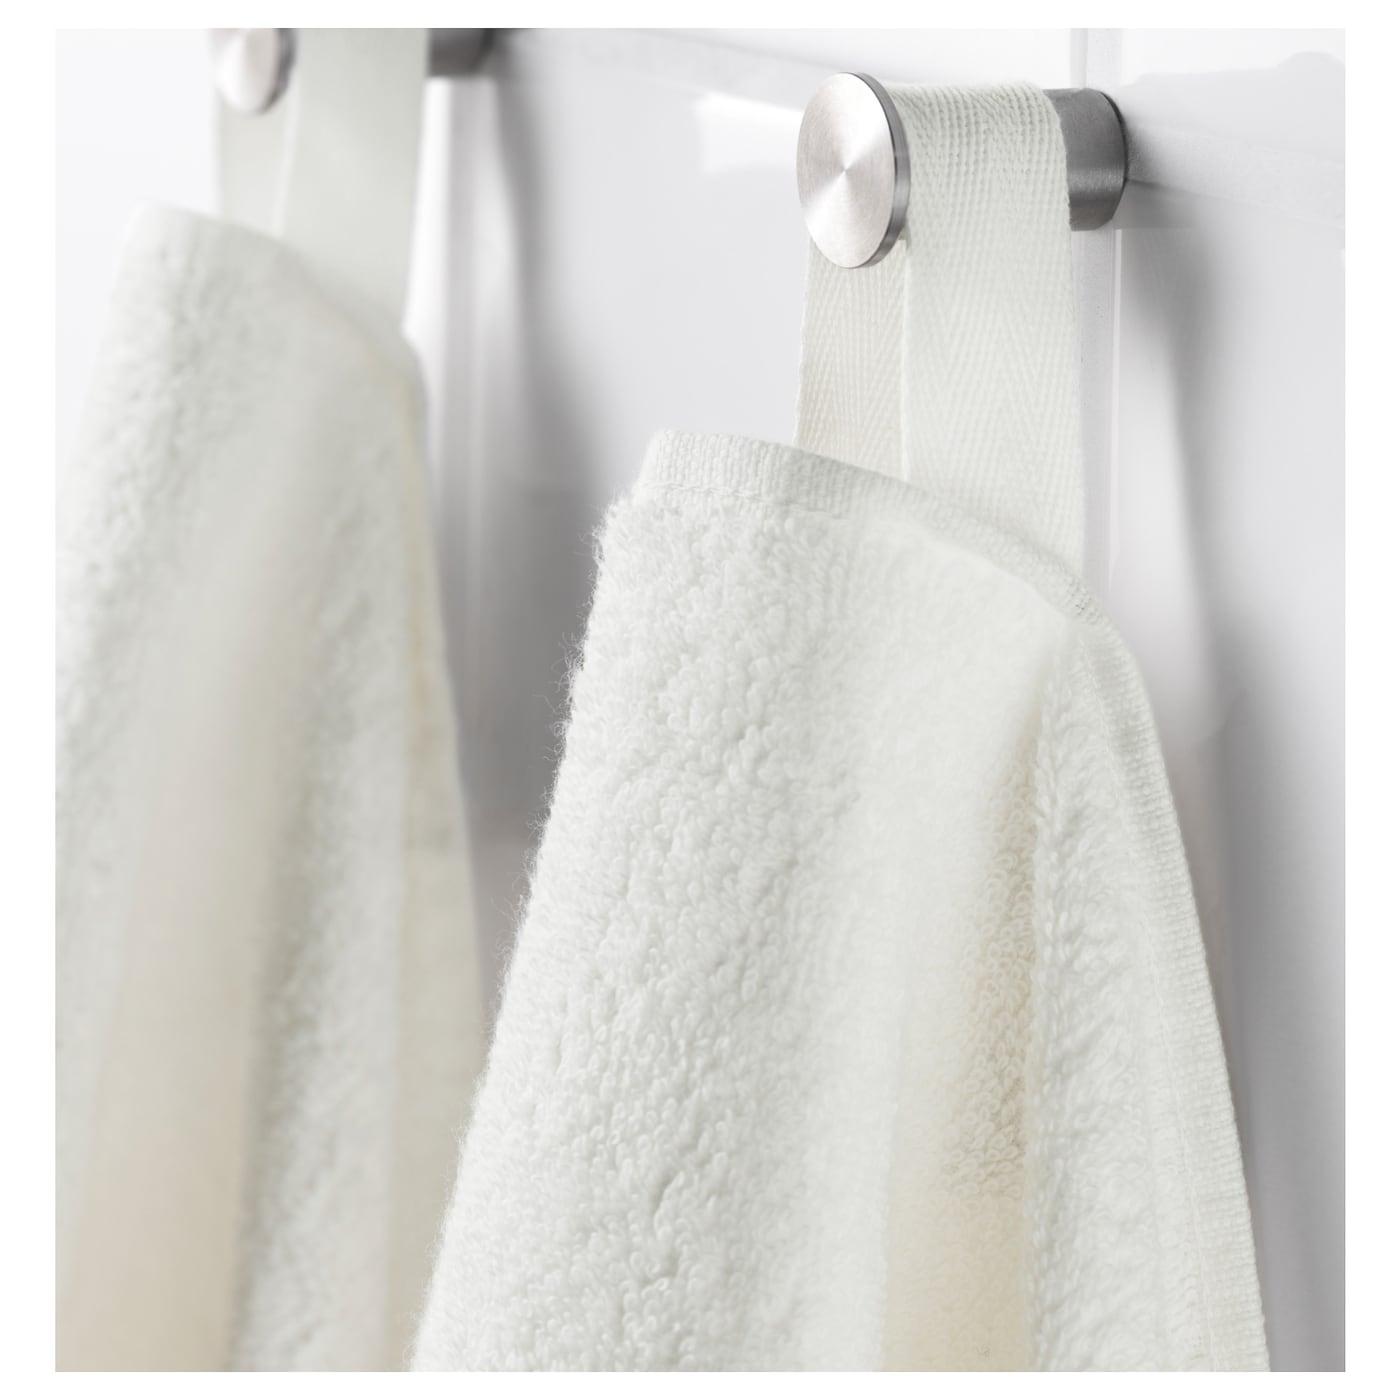 h ren drap de bain blanc 70x140 cm ikea. Black Bedroom Furniture Sets. Home Design Ideas